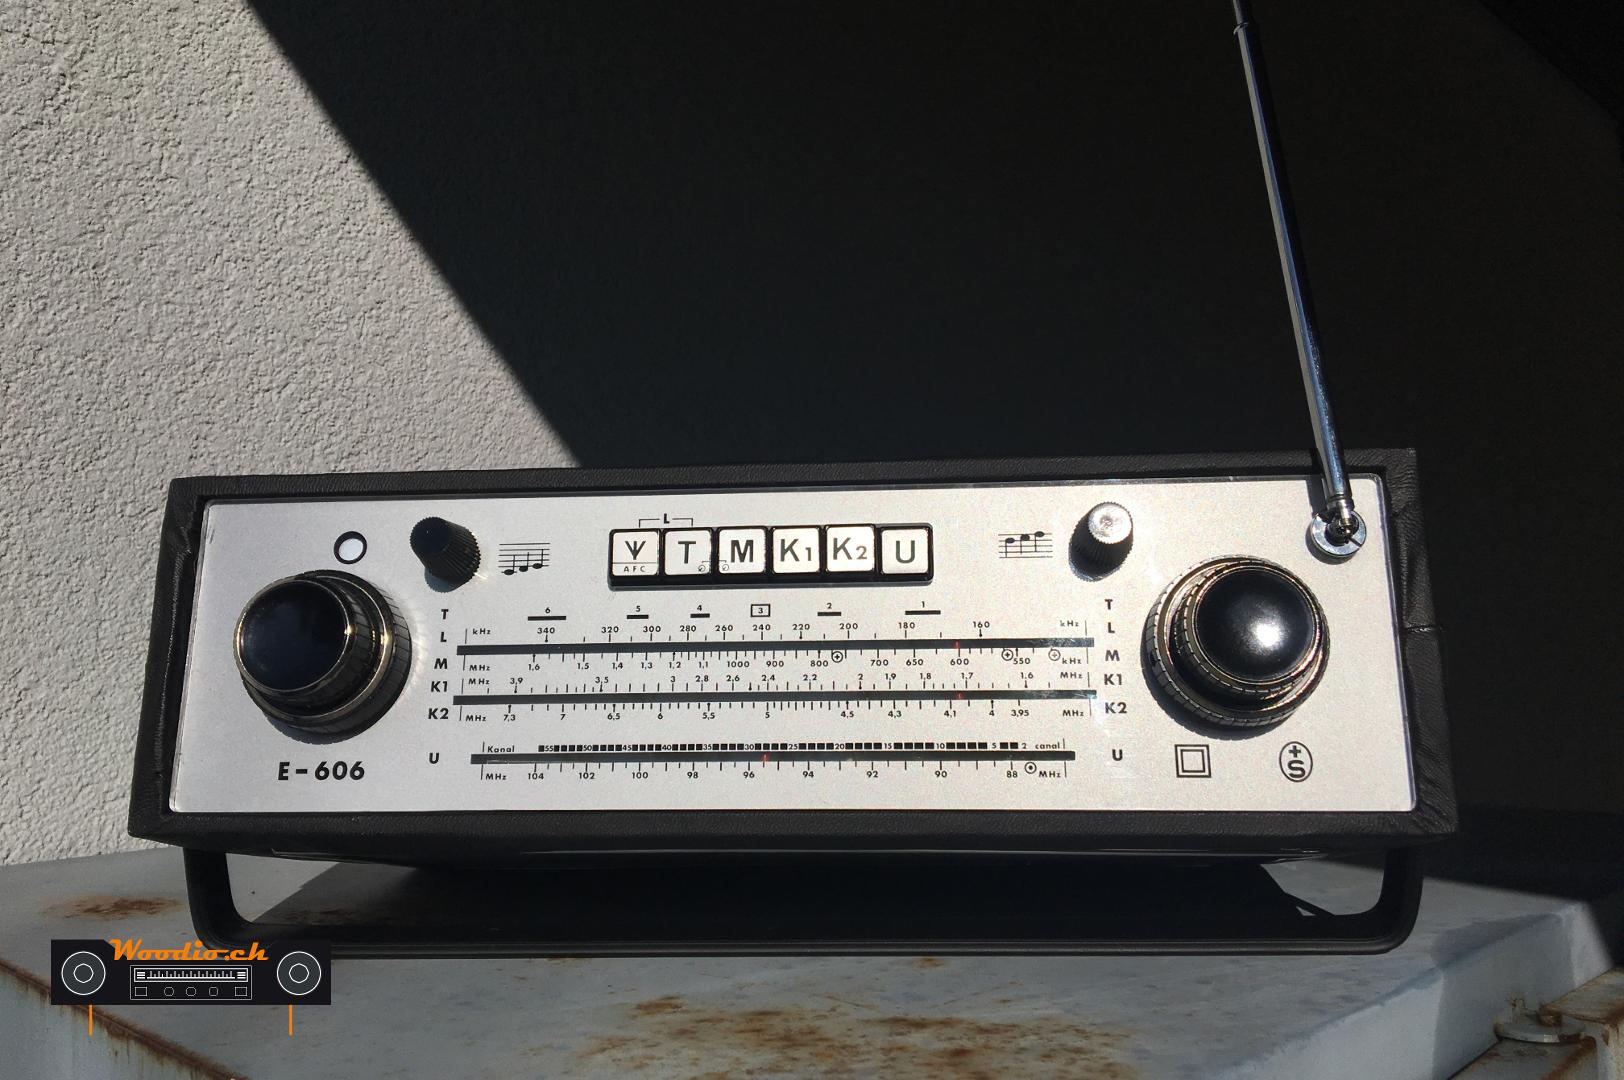 Biennophone E-606